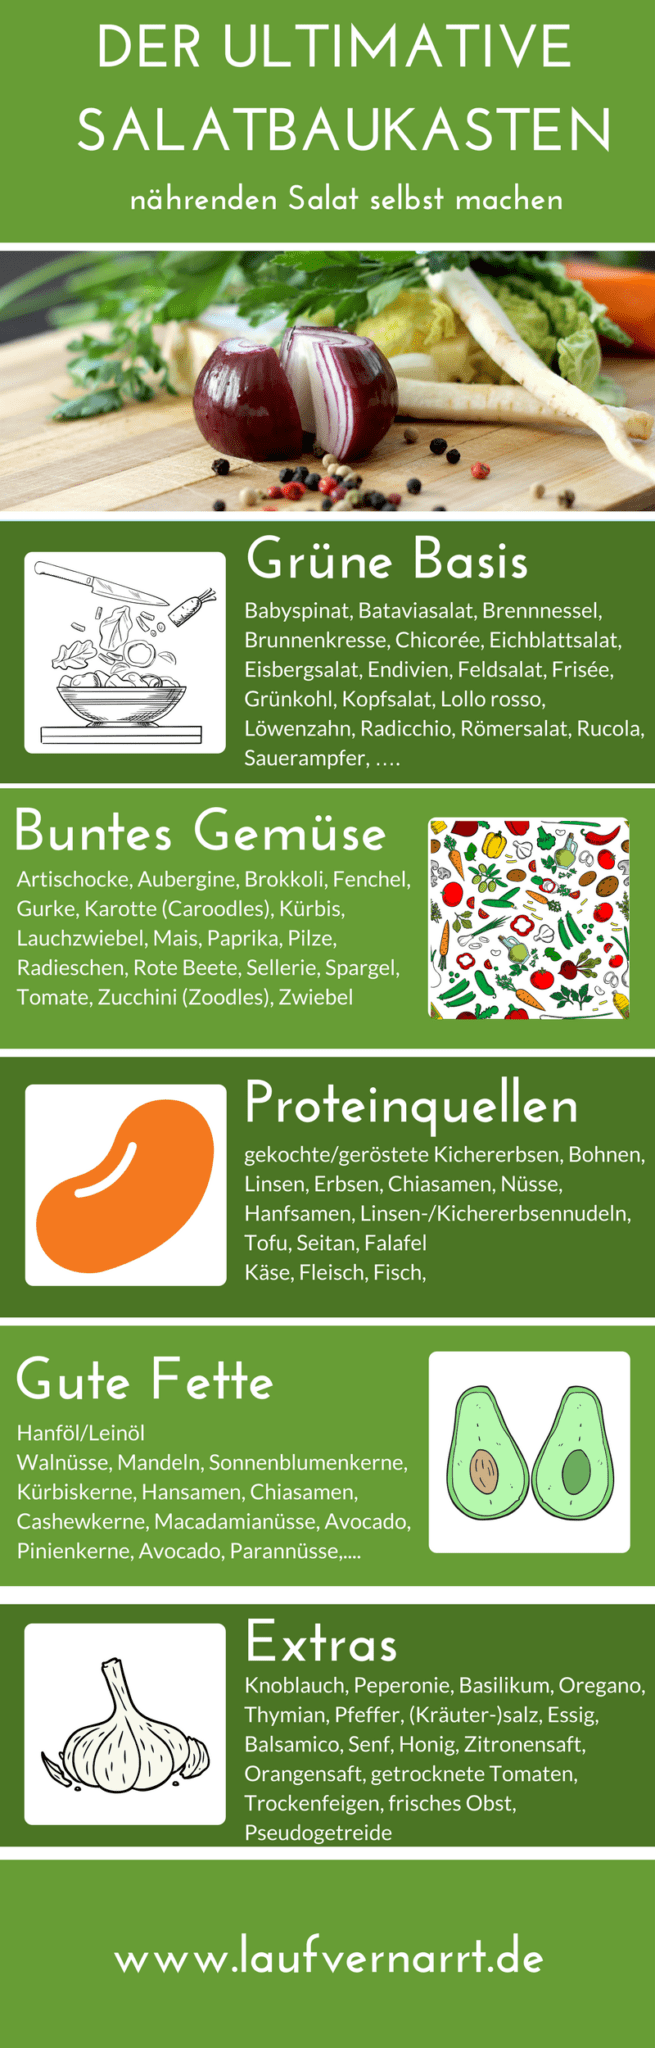 Alles über Salat inkl. Printable - 30 Tage Ernährungsumstellung Tag 16 - Laufvernarrt #dietmenu